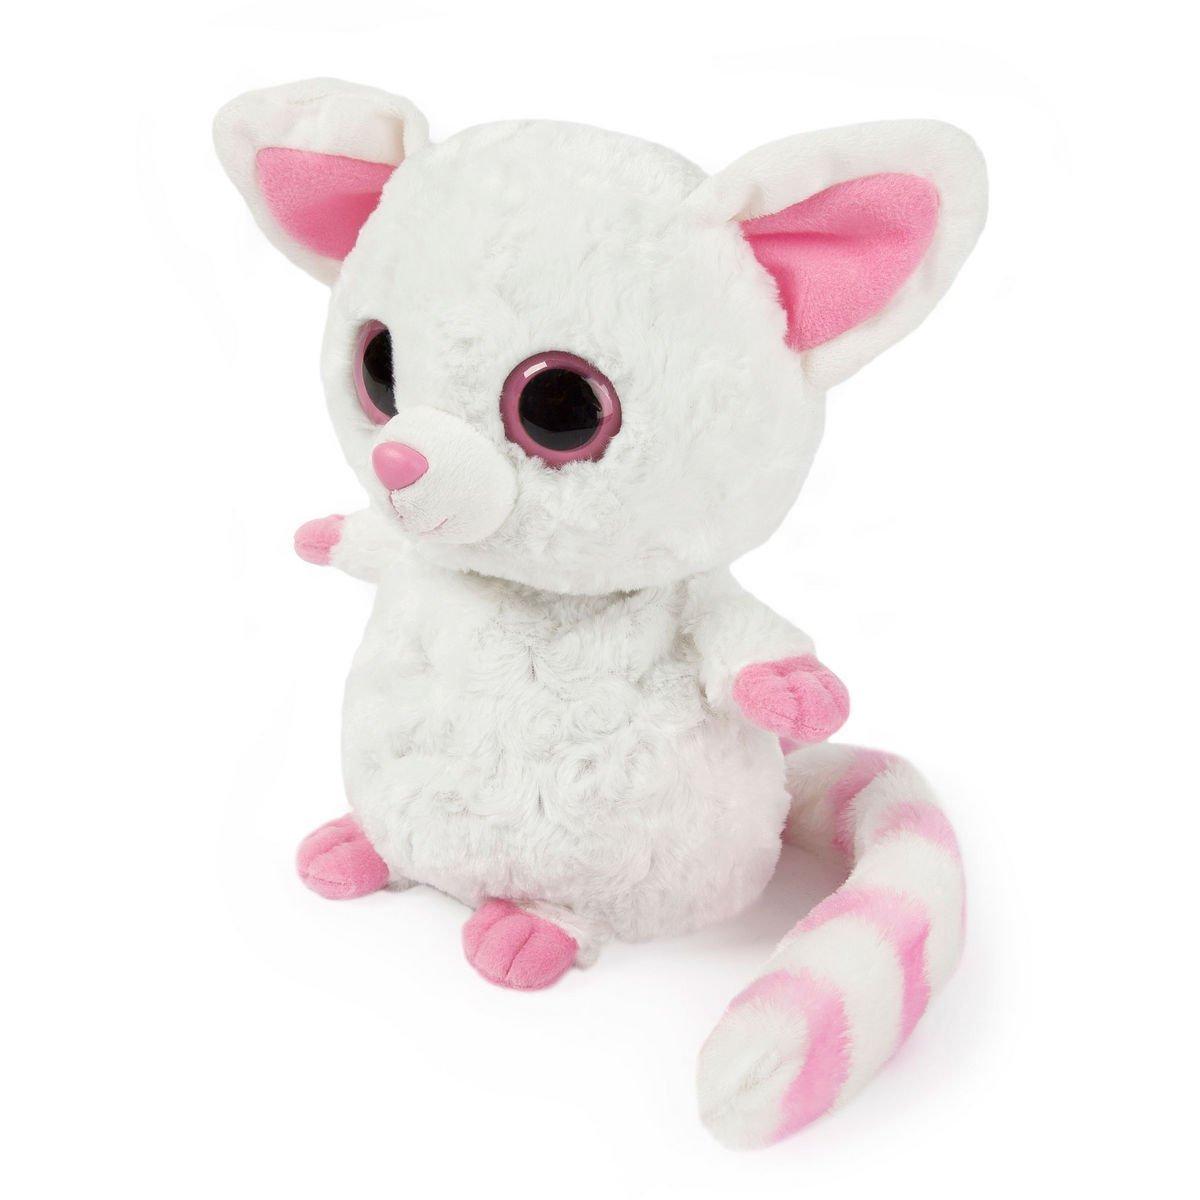 Intelex Yoohoo and Friends Microwavable Heatable Toy, Pamee